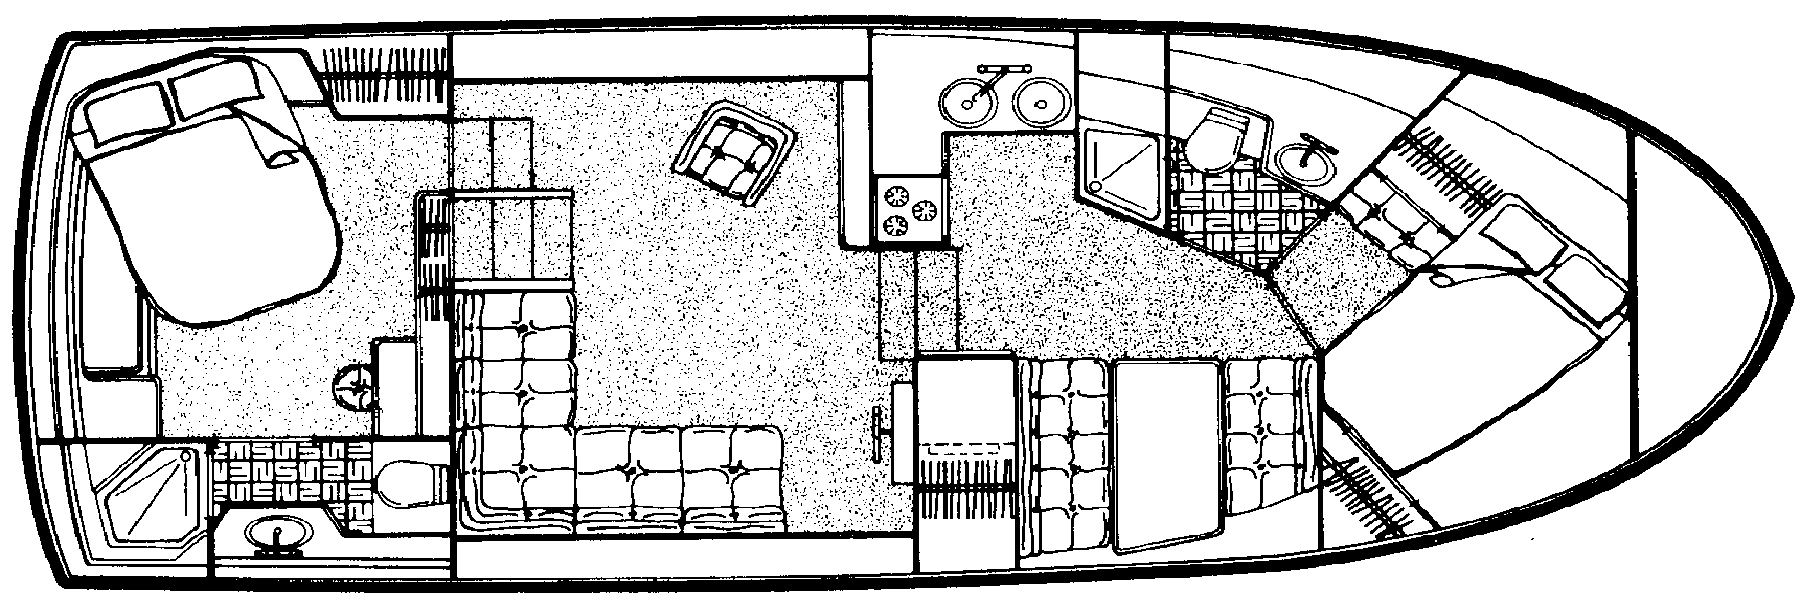 3807 Aft Cabin; 390 Aft Cabin Floor Plan 2